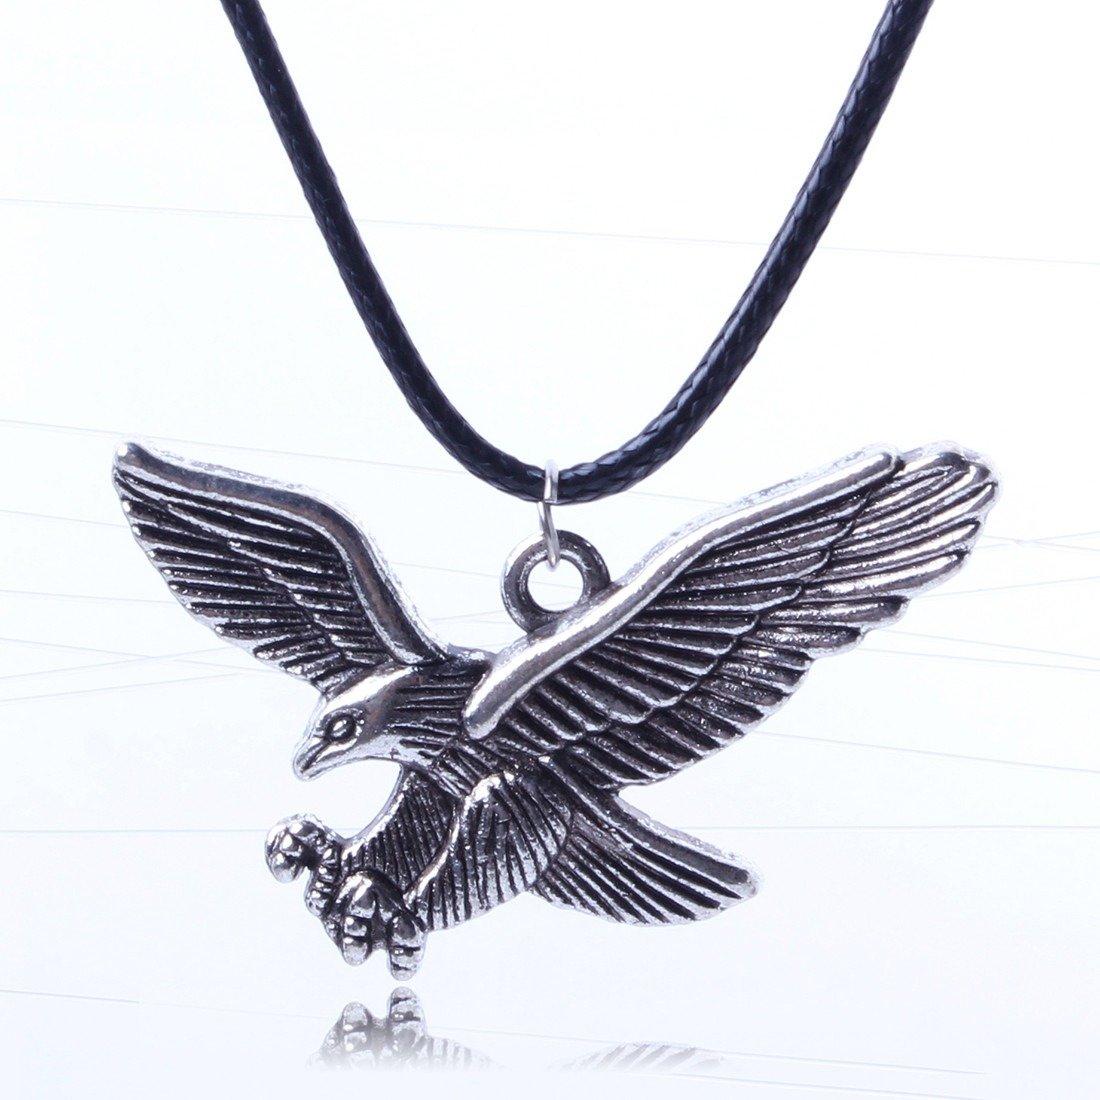 Qiyun Hunting Eagle Bird Vintage Retro Tibet Silver Pendant Black Rope Cord Necklace Chasse Aigle Oiseau Argent Vintage Noir Corde Cordon Collier W005N1461